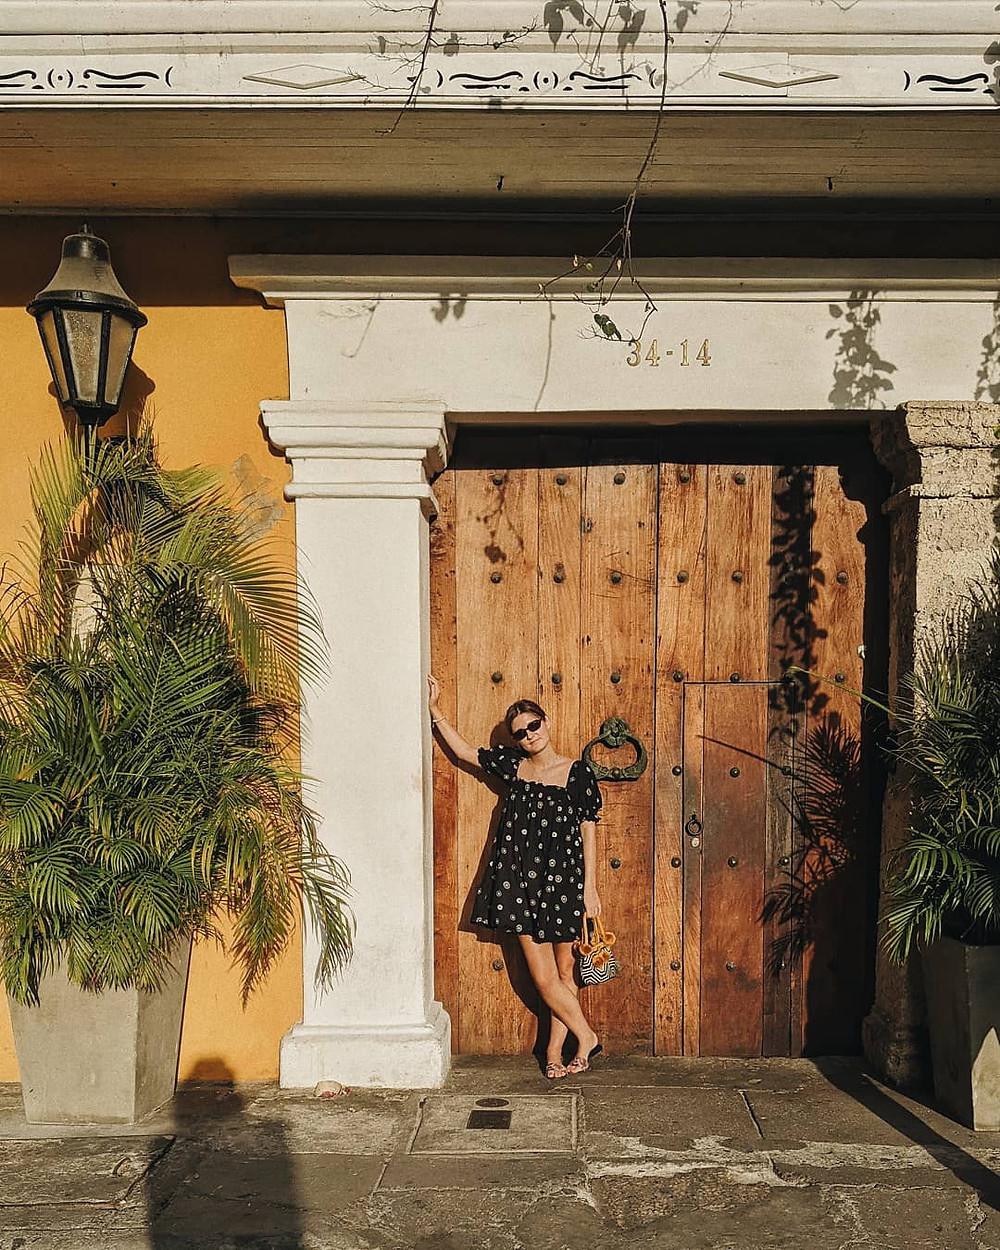 sophie hay stands in front of door on tropical vacation